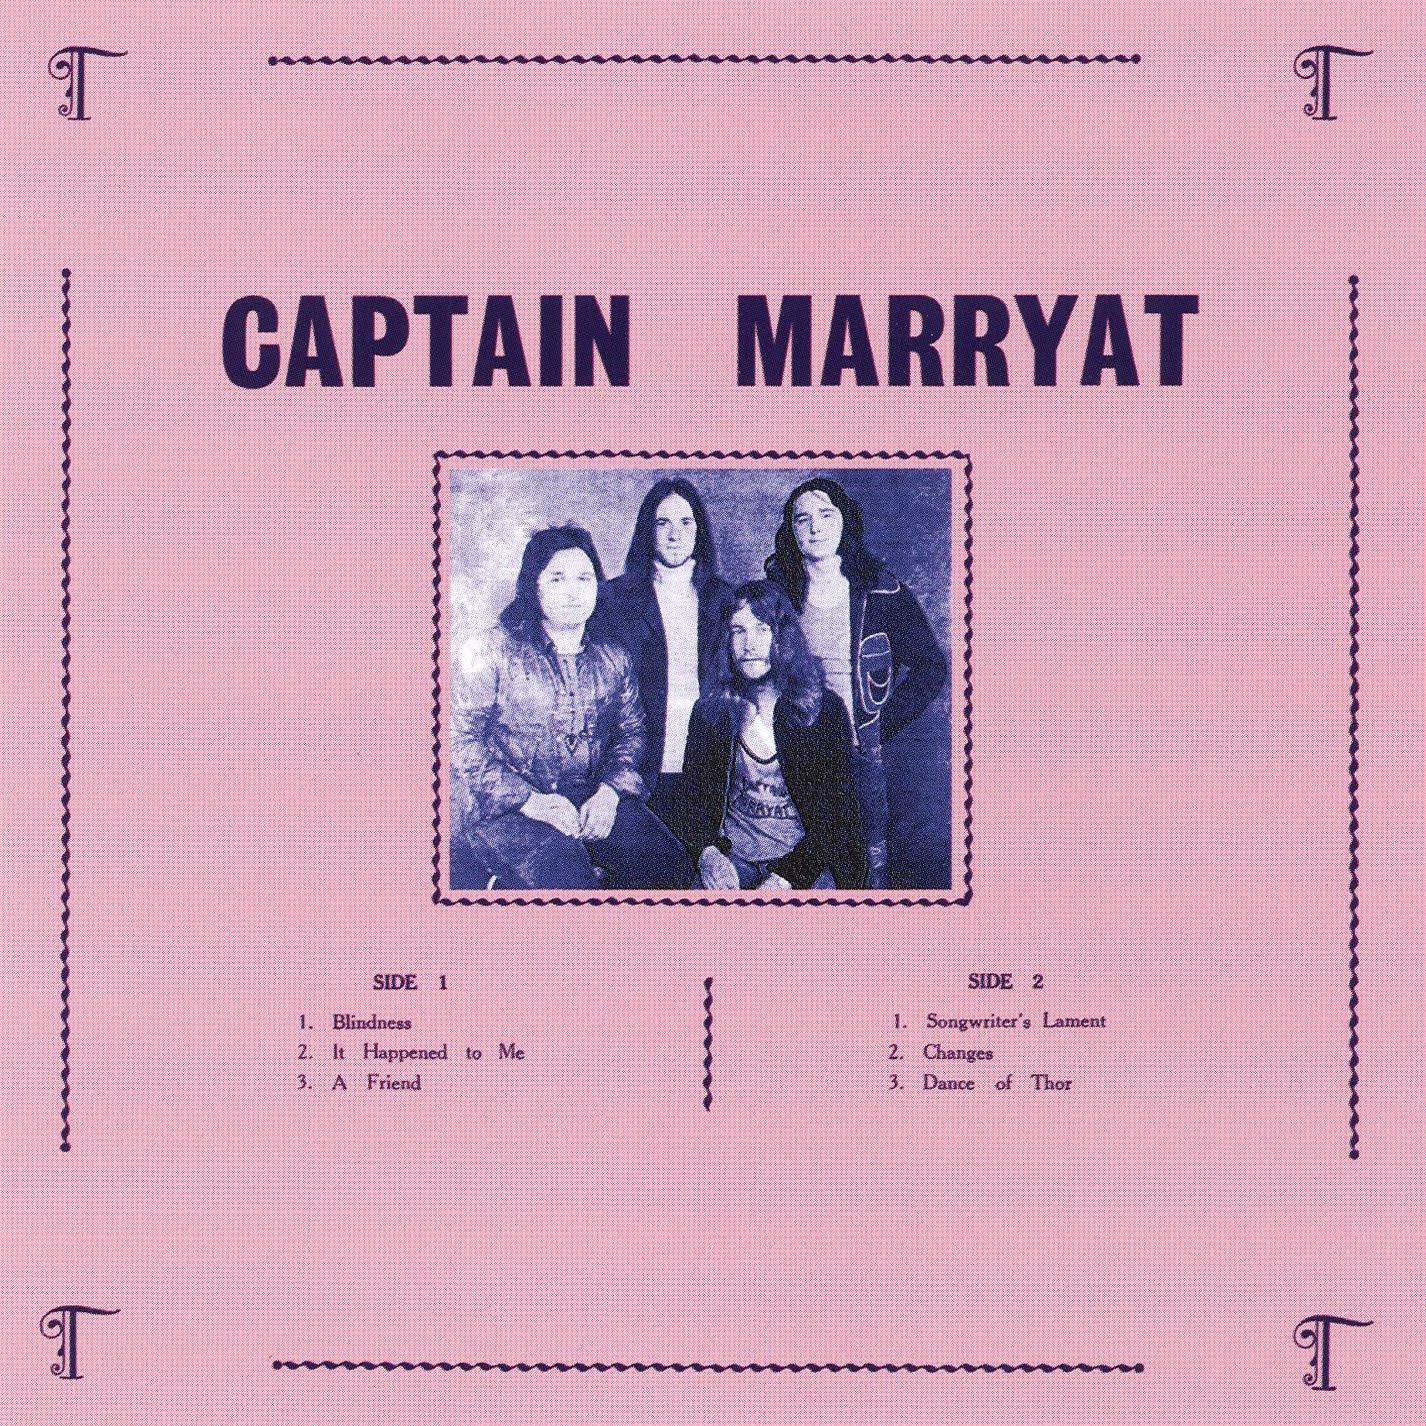 ESTOY ESCUCHANDO... (IX) Captain+Marryat+-+Front